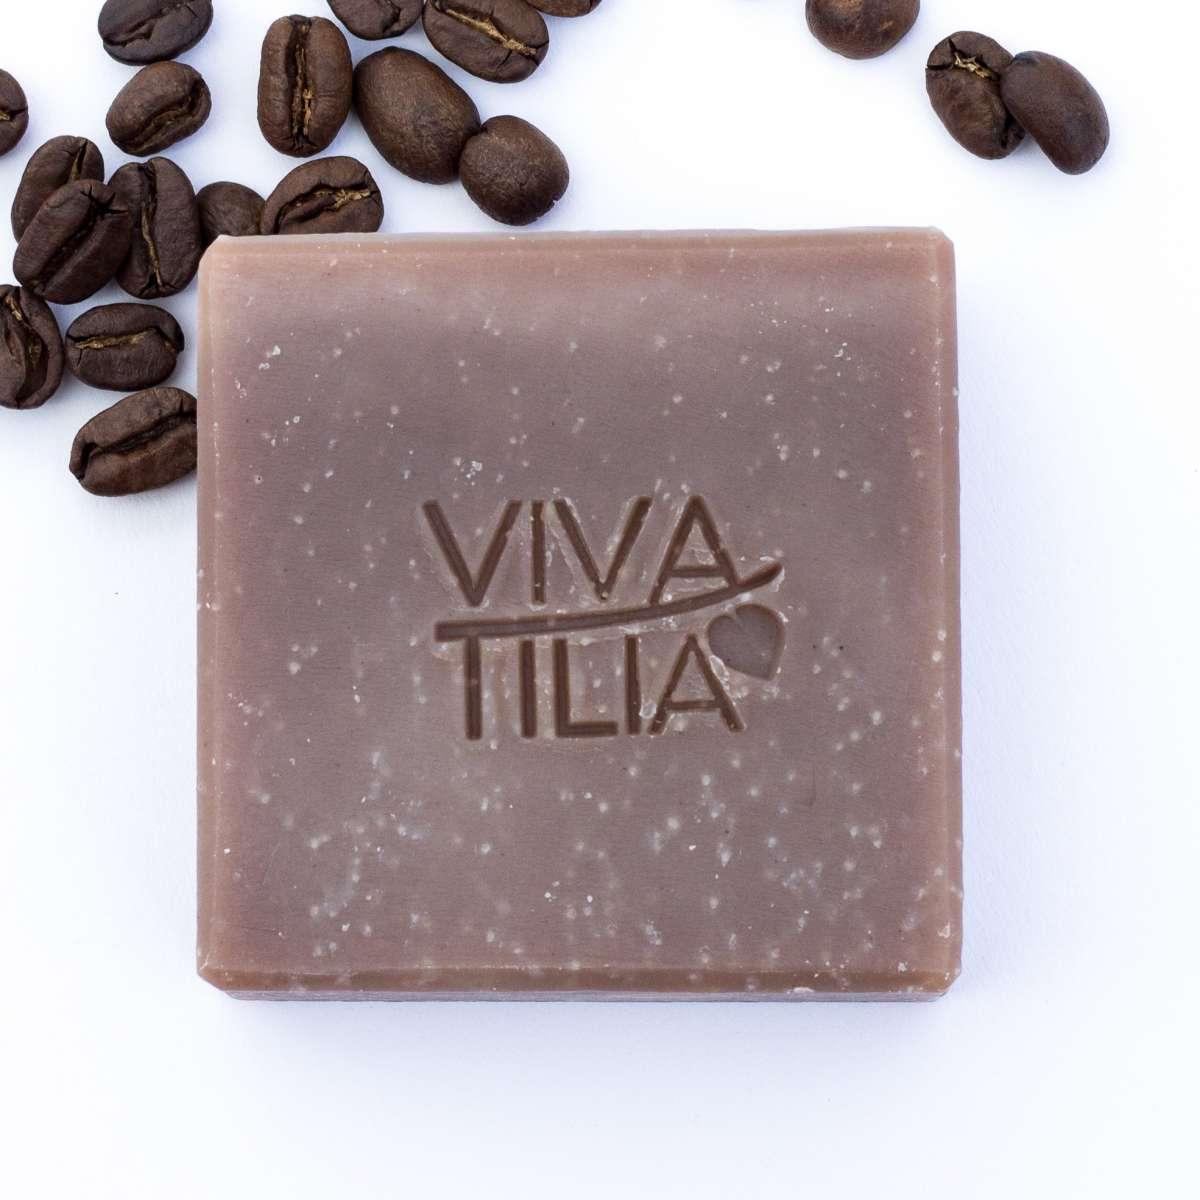 VIVA TILIA Espresso Naturseife 90 g